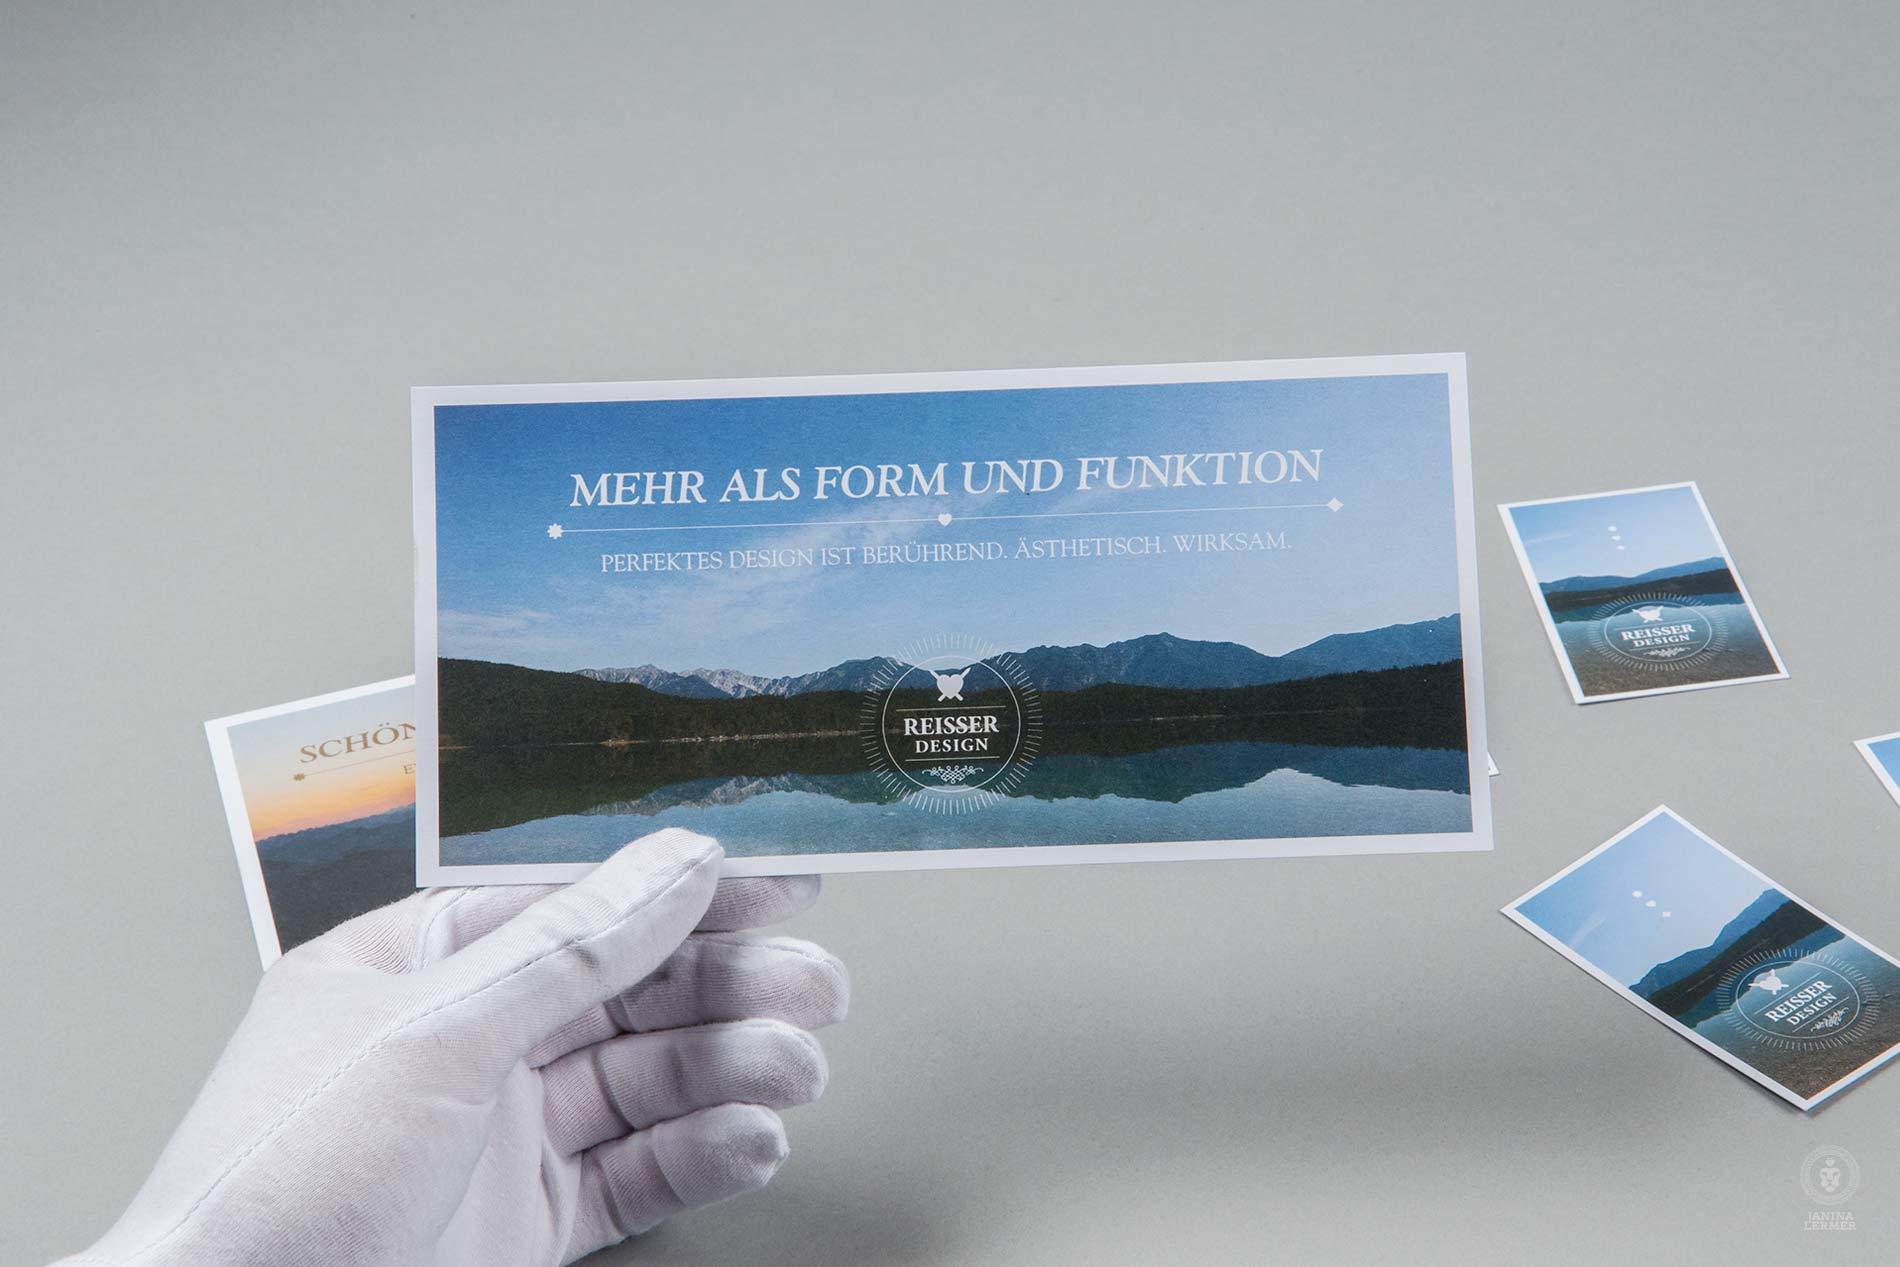 Janina-Lermer-Markengestaltung-Branddesign-Corporate-Design-Reisserdesign-Grusskarte-Greetingcard-2